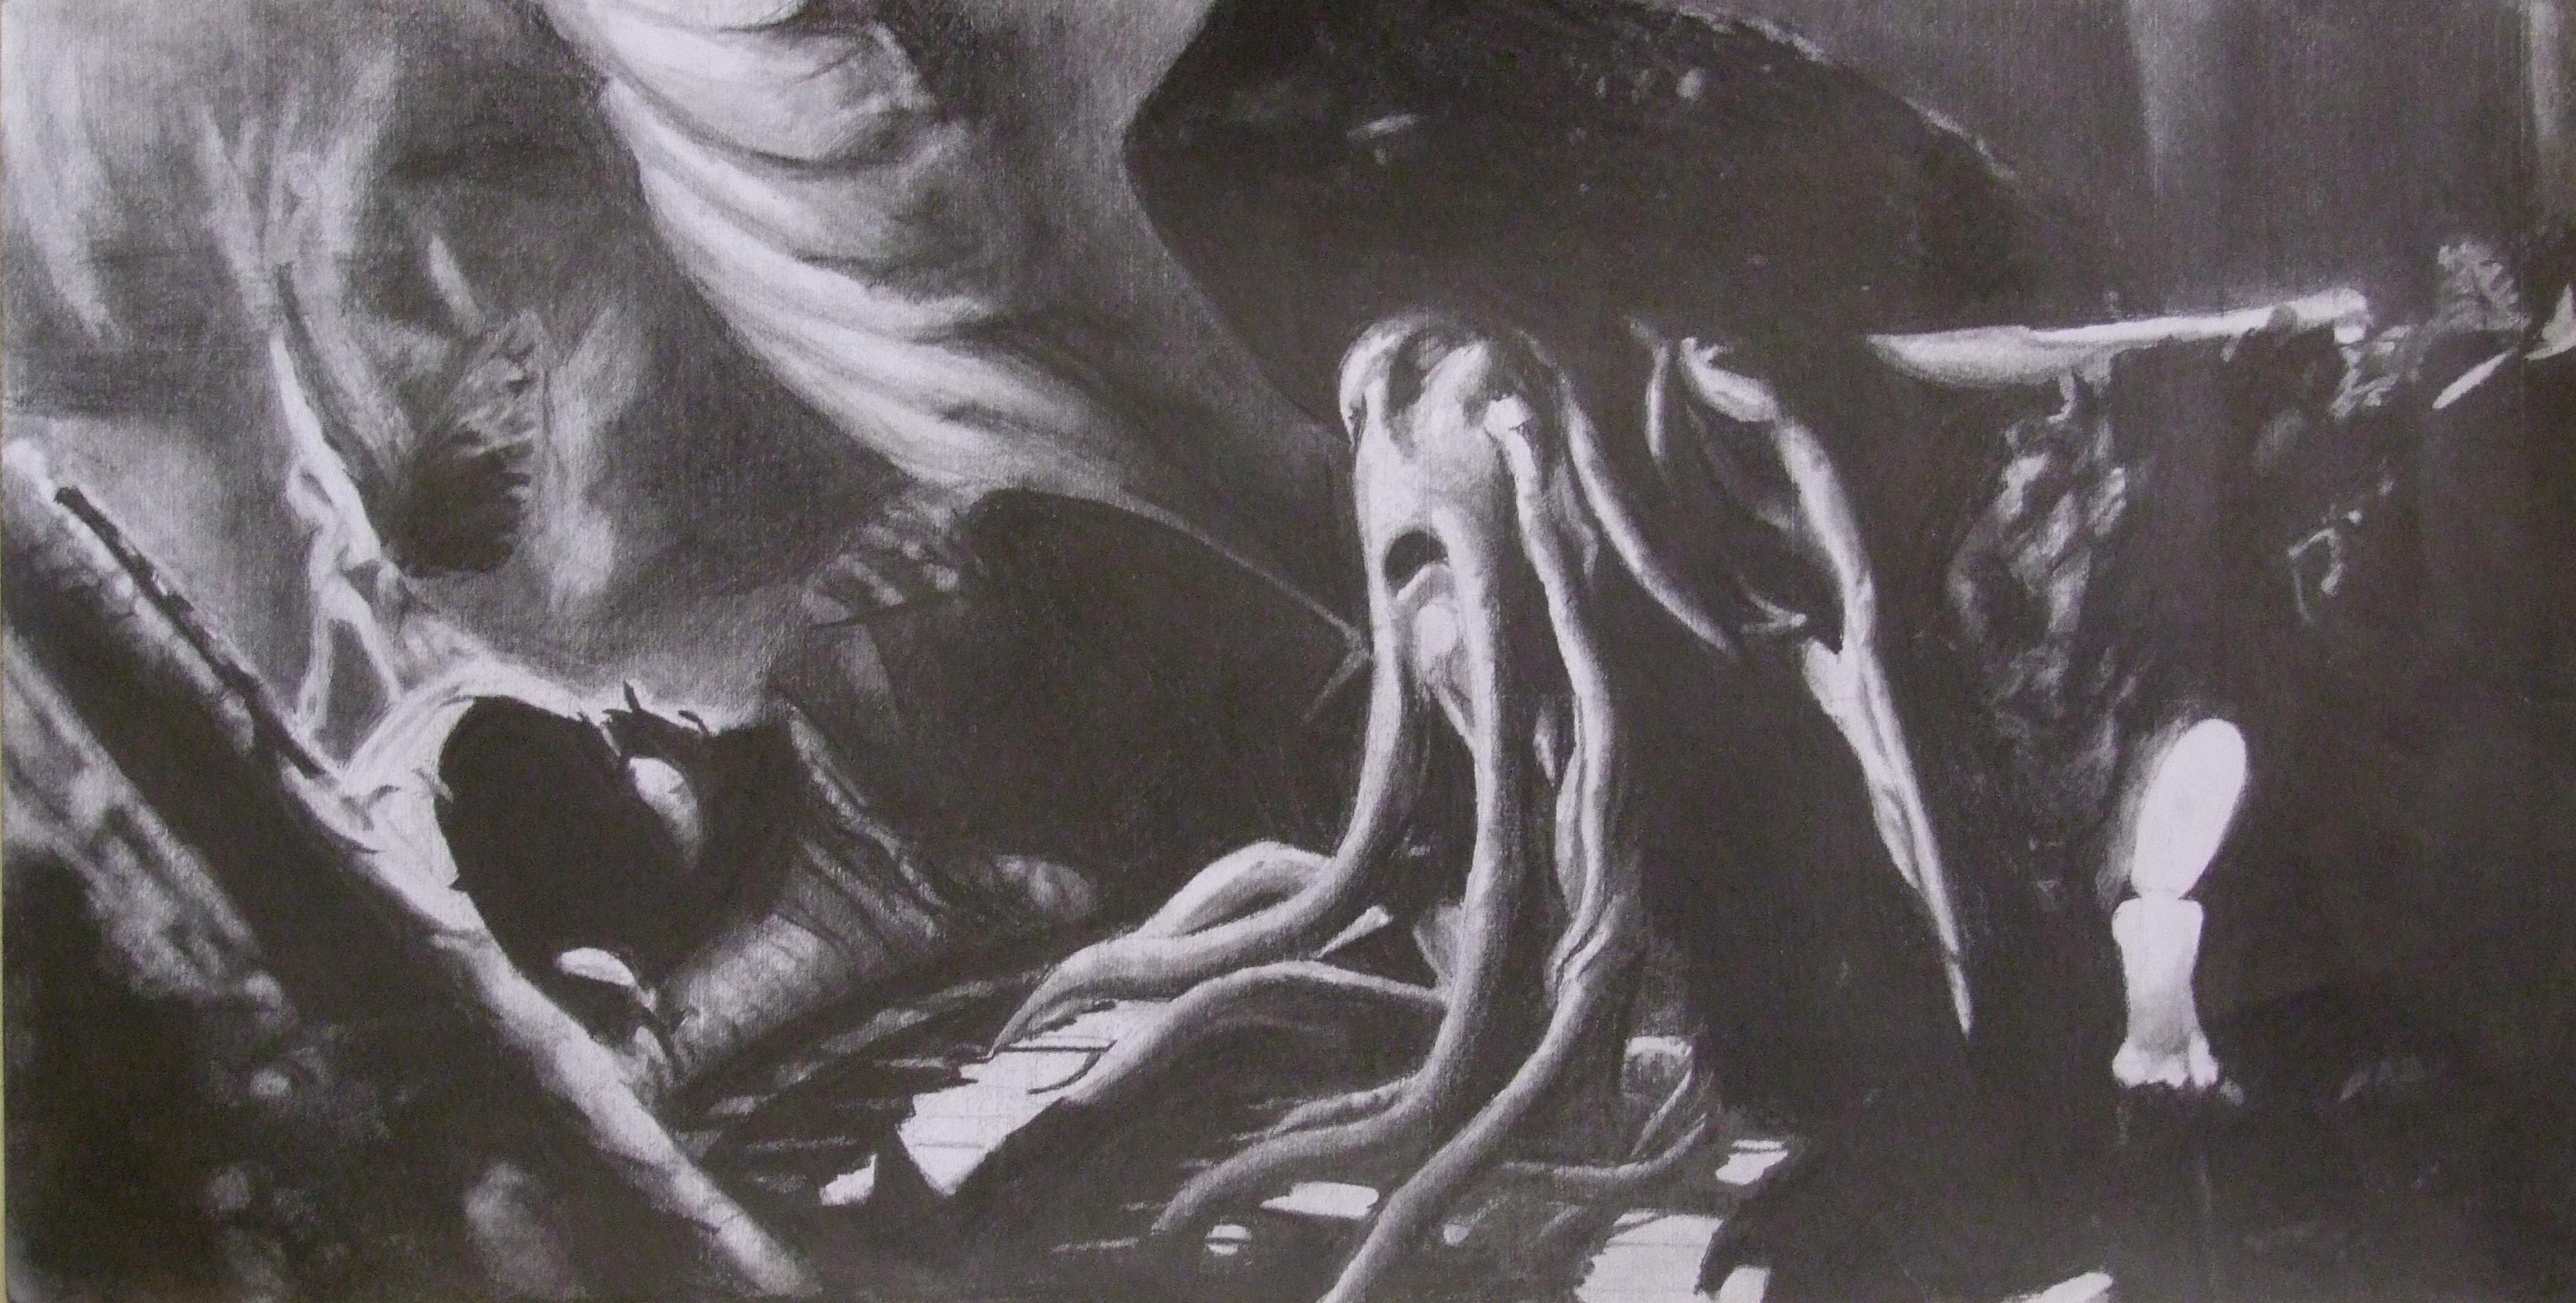 Davy Jones en el organo by belfast1911